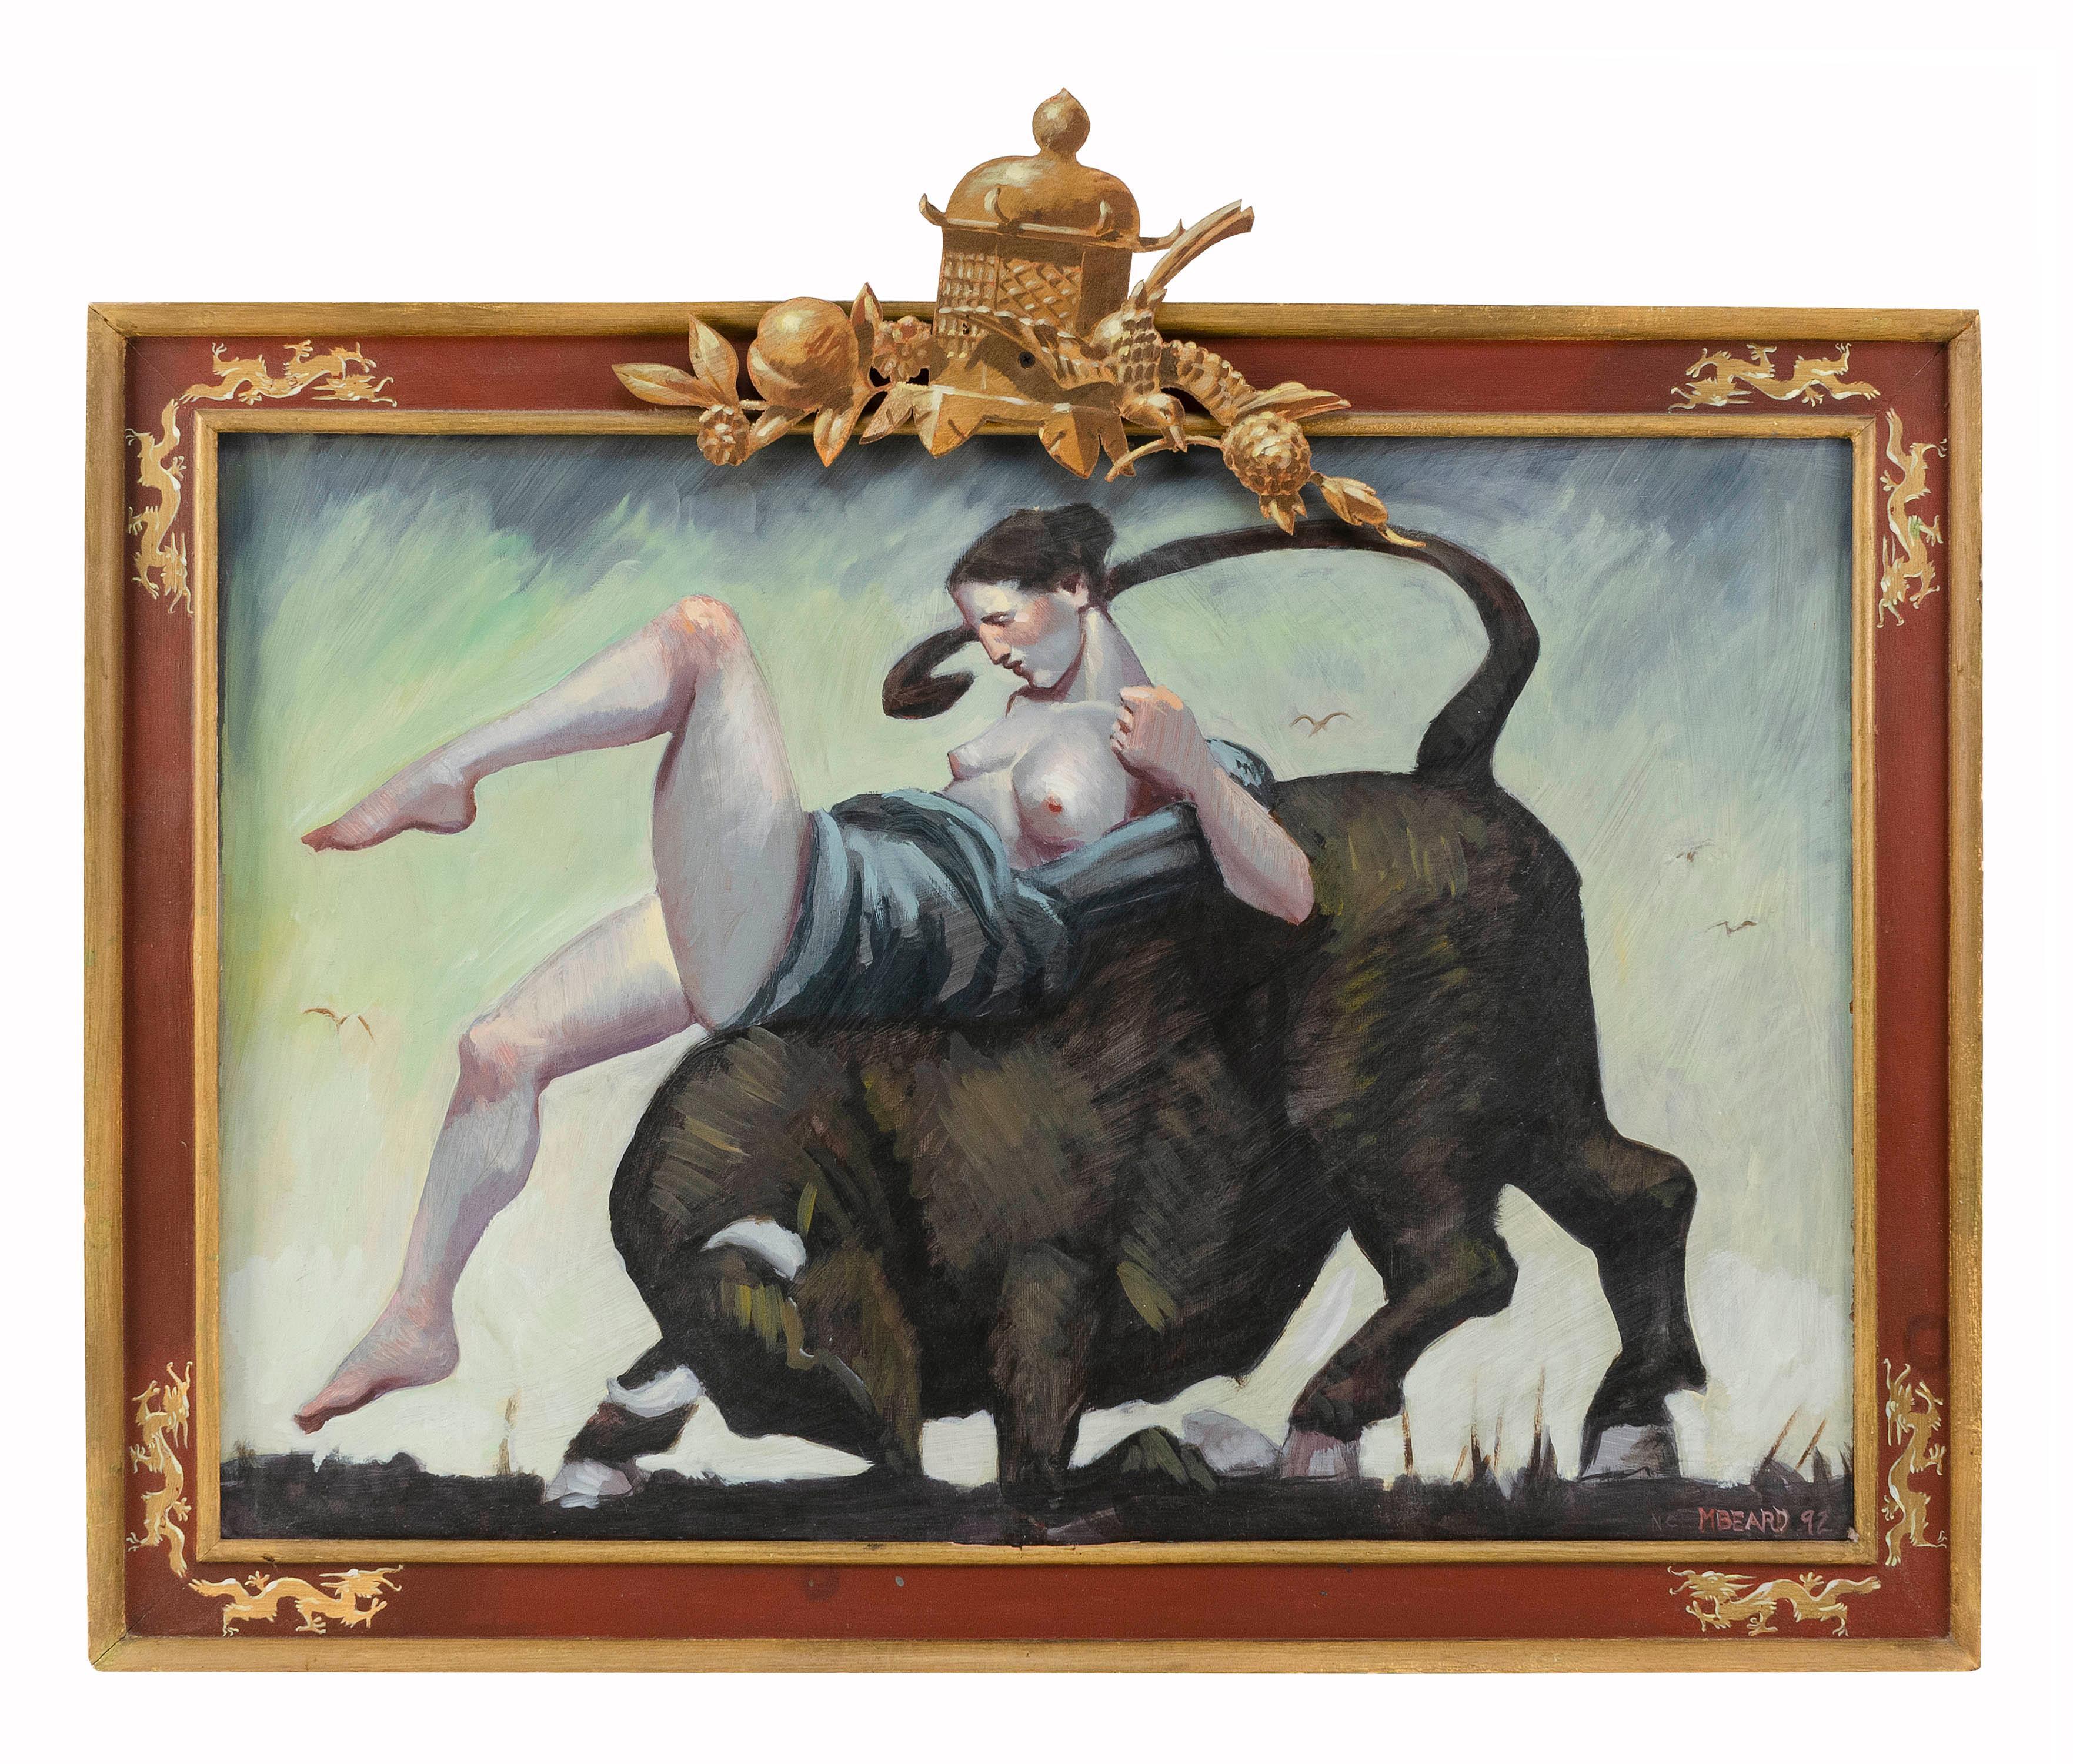 "MARK BEARD, New York/Utah, b. 1956, A semi-nude woman on the back of a bull., Oil on board, 24"" x 36"". Framed 33.5"" x 41""."